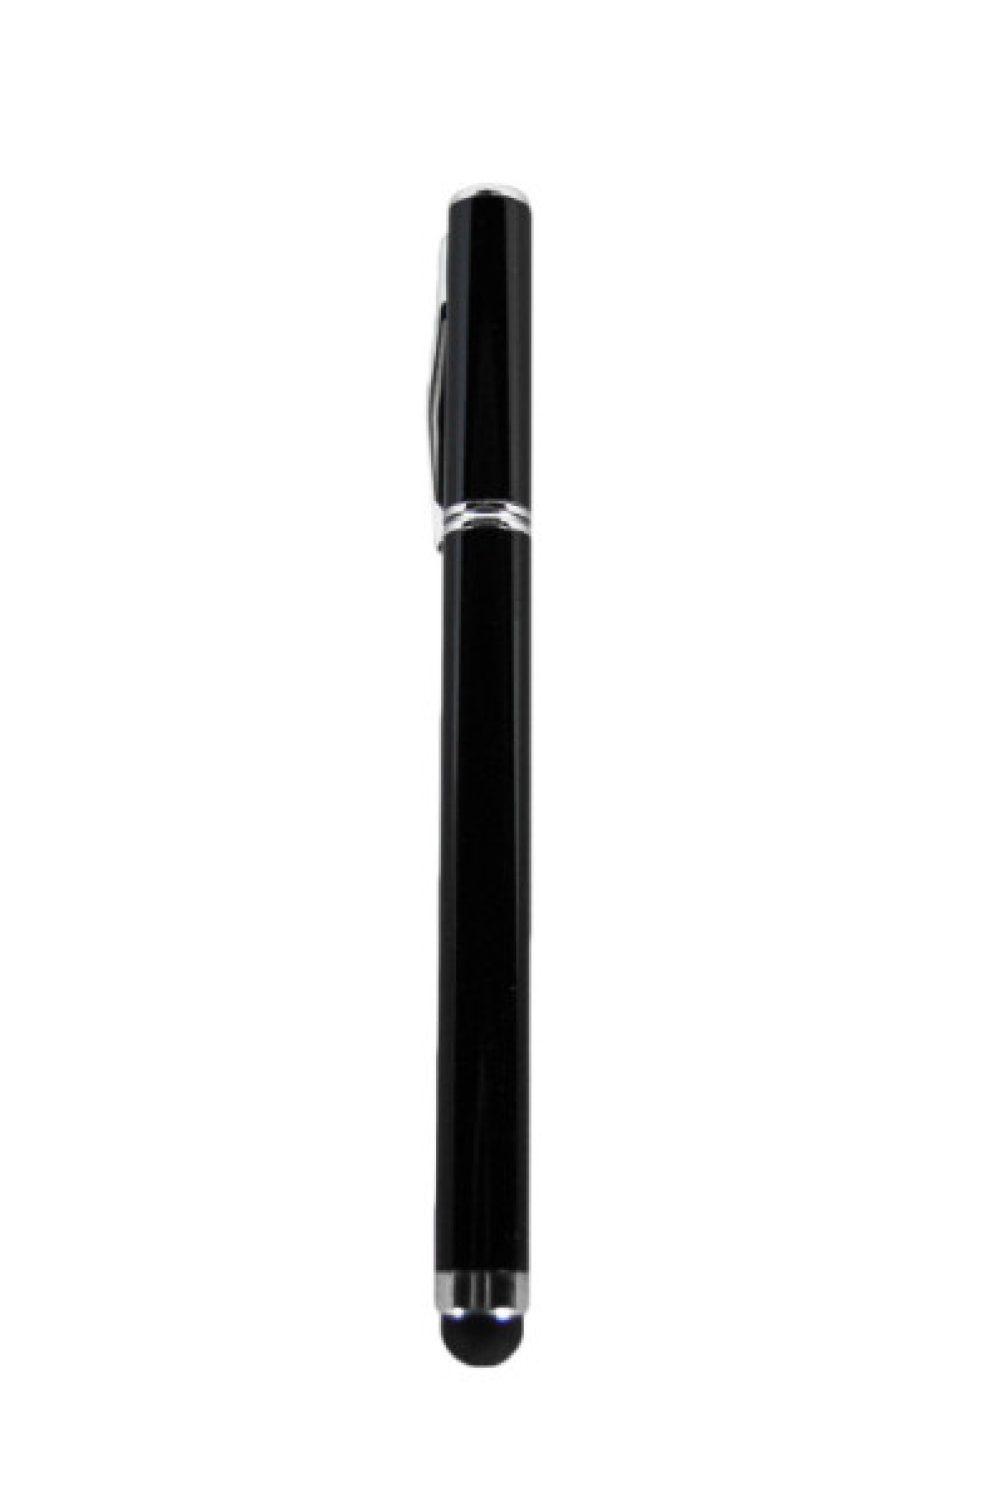 Stylus pen zwart